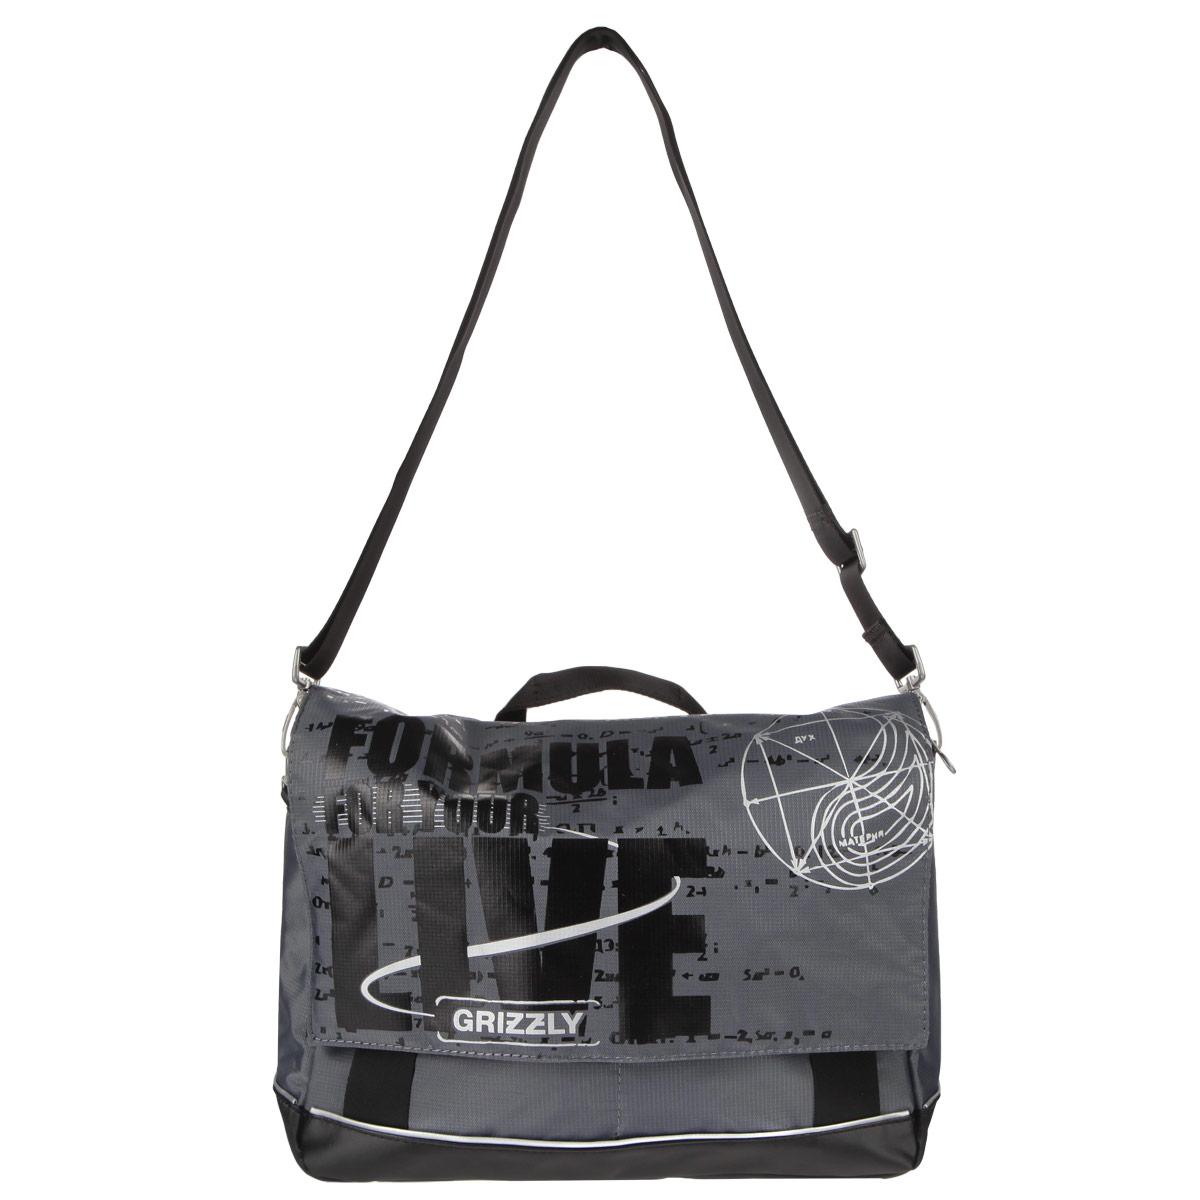 Grizzly Сумка школьная цвет черный серыйММ 341-2/2